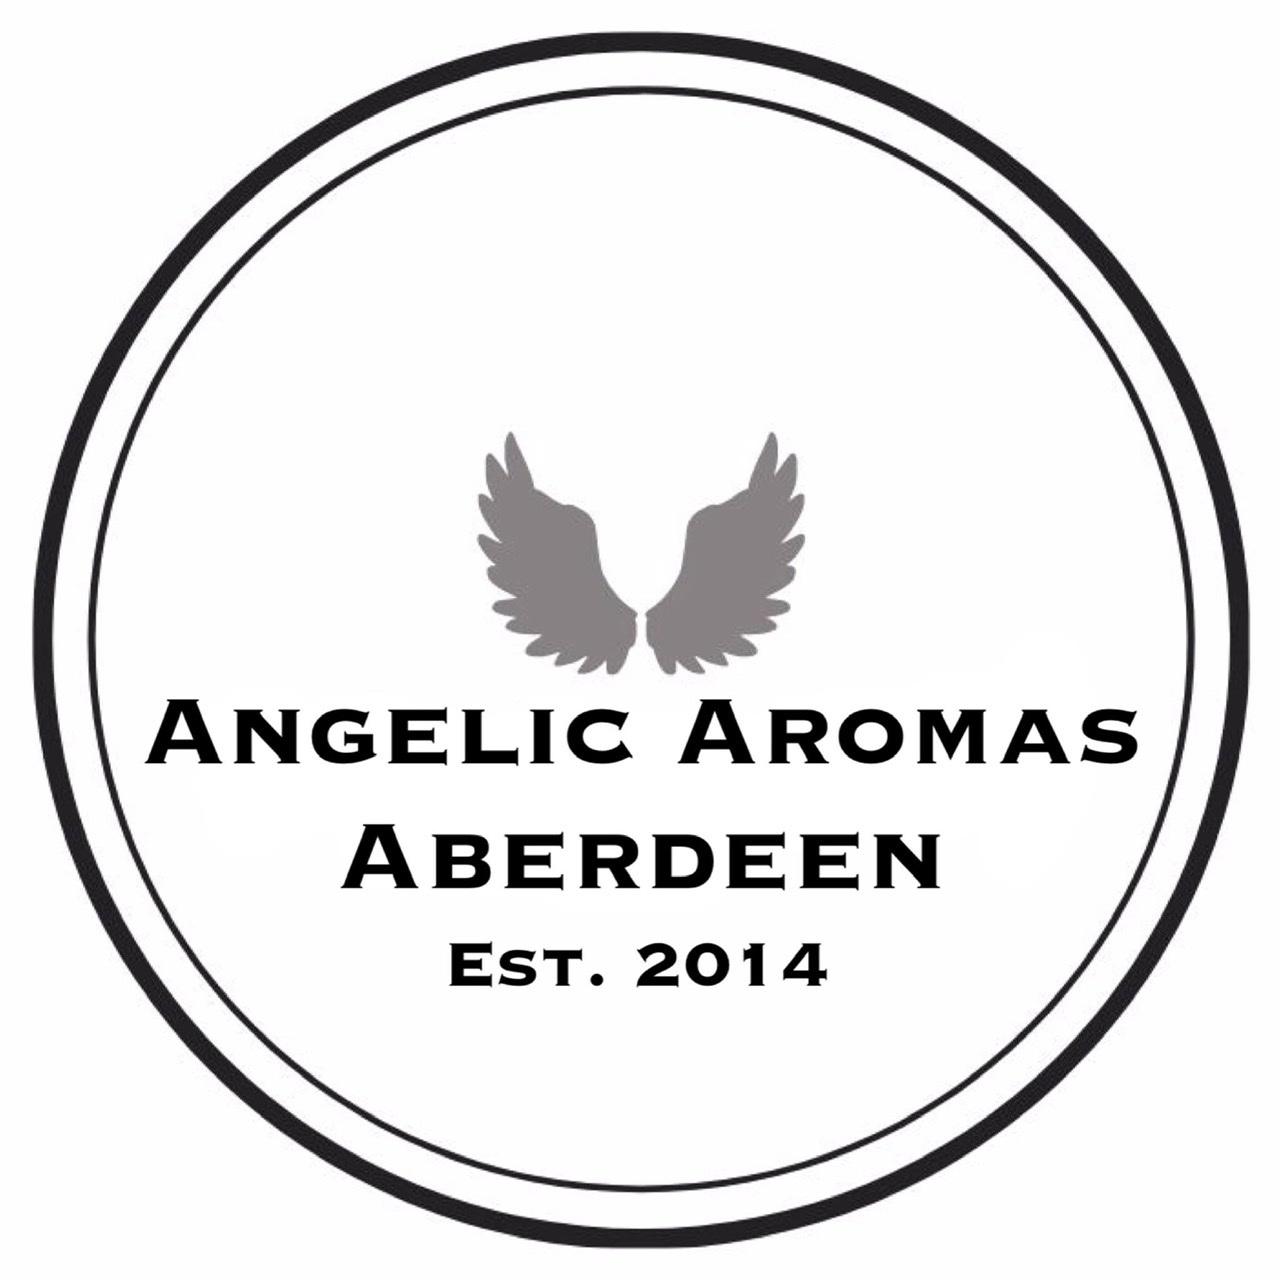 Angelic Aromas Aberdeen